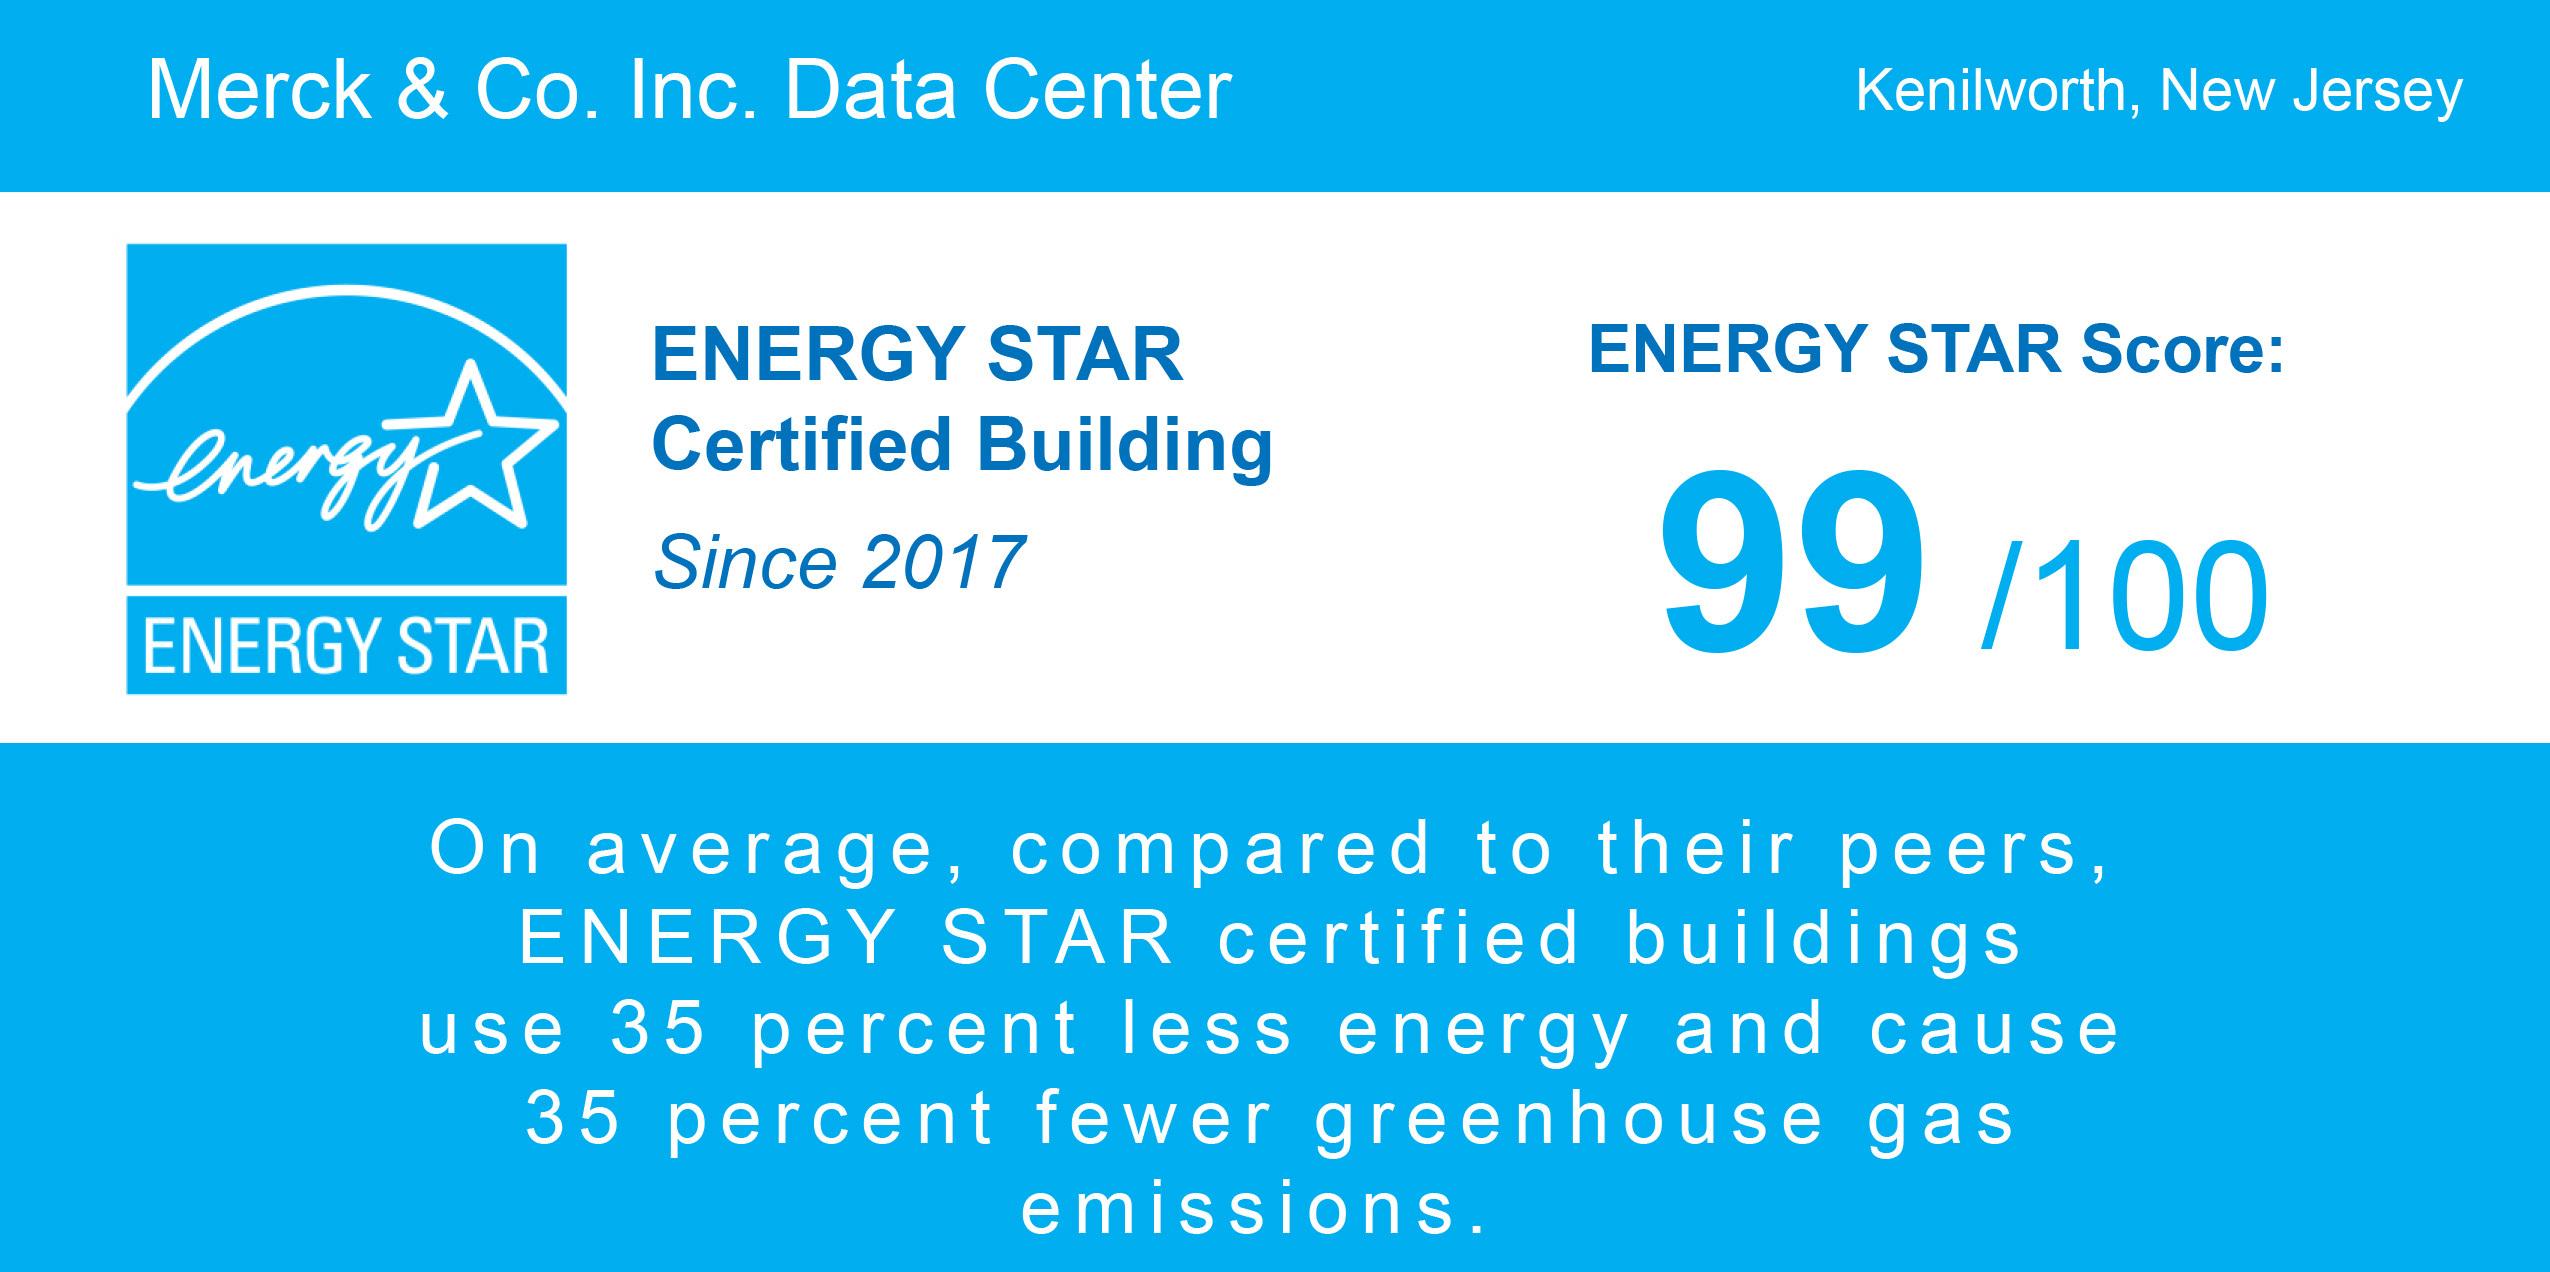 Merck Energy Star Infographic Jpeg